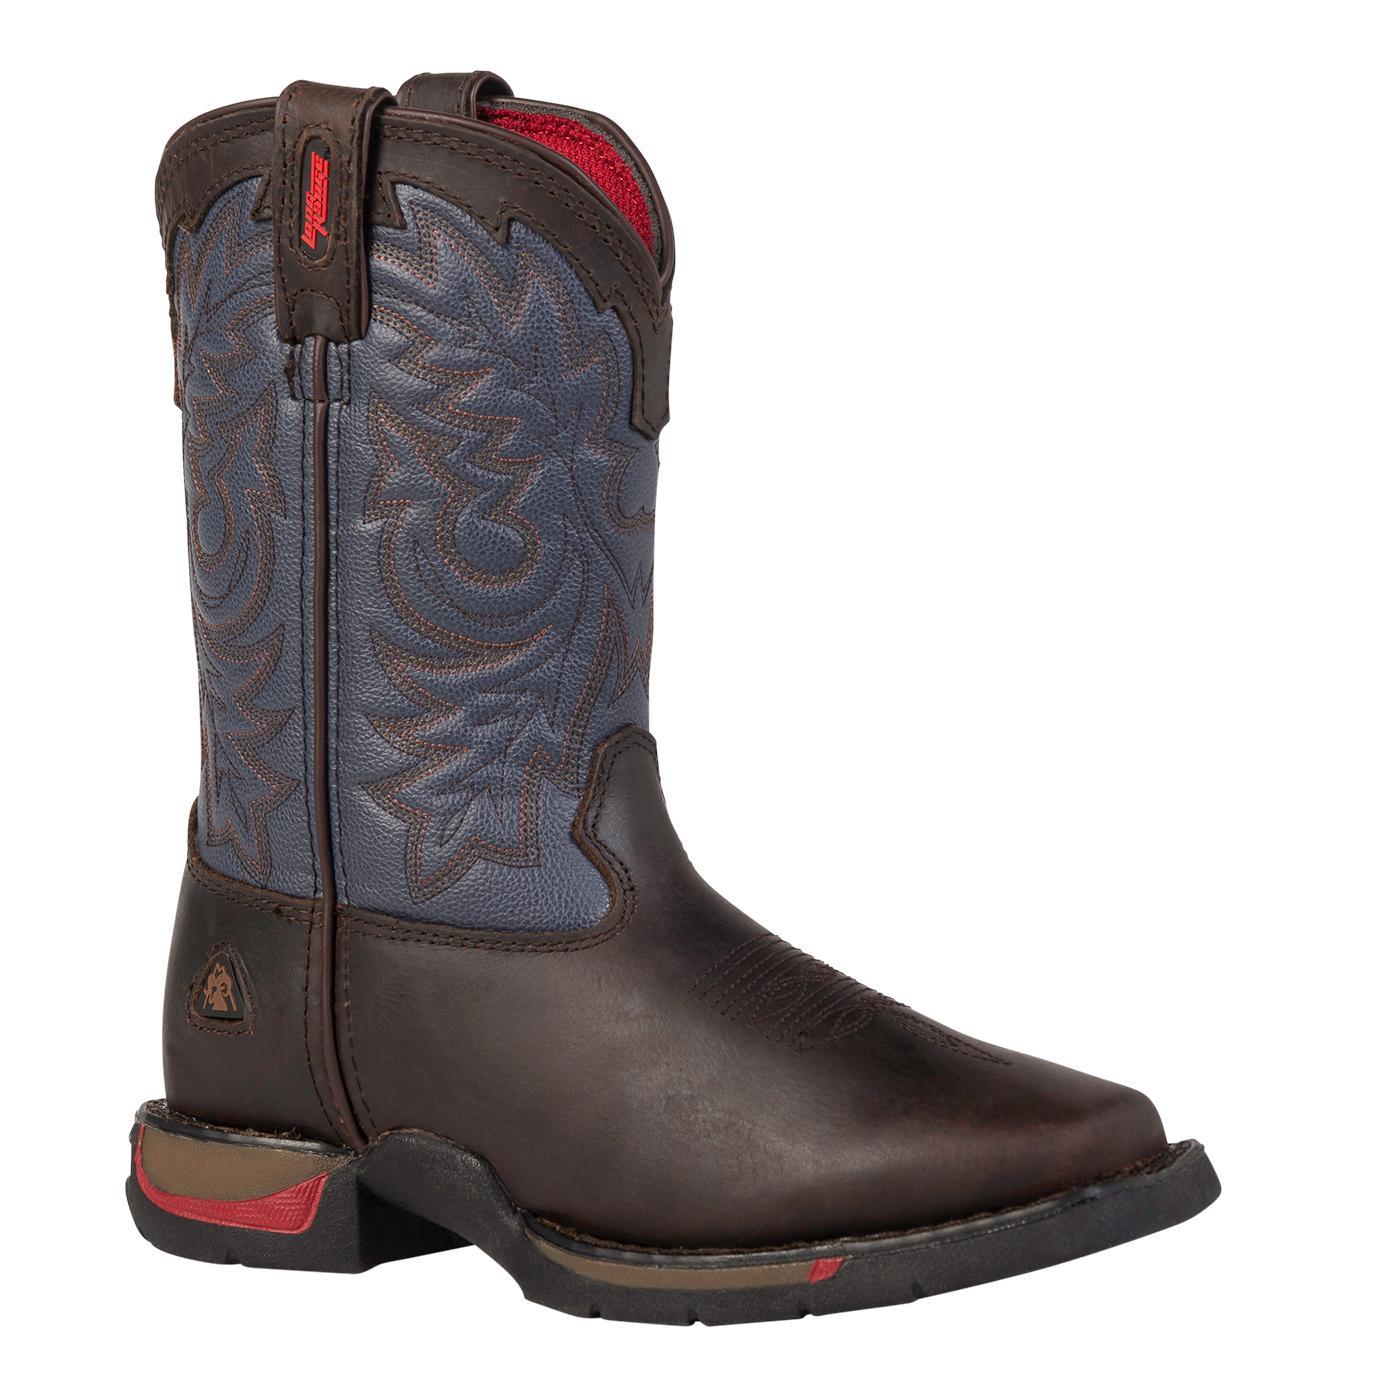 Rocky Long Range Kid's Square-Toe Western Boots